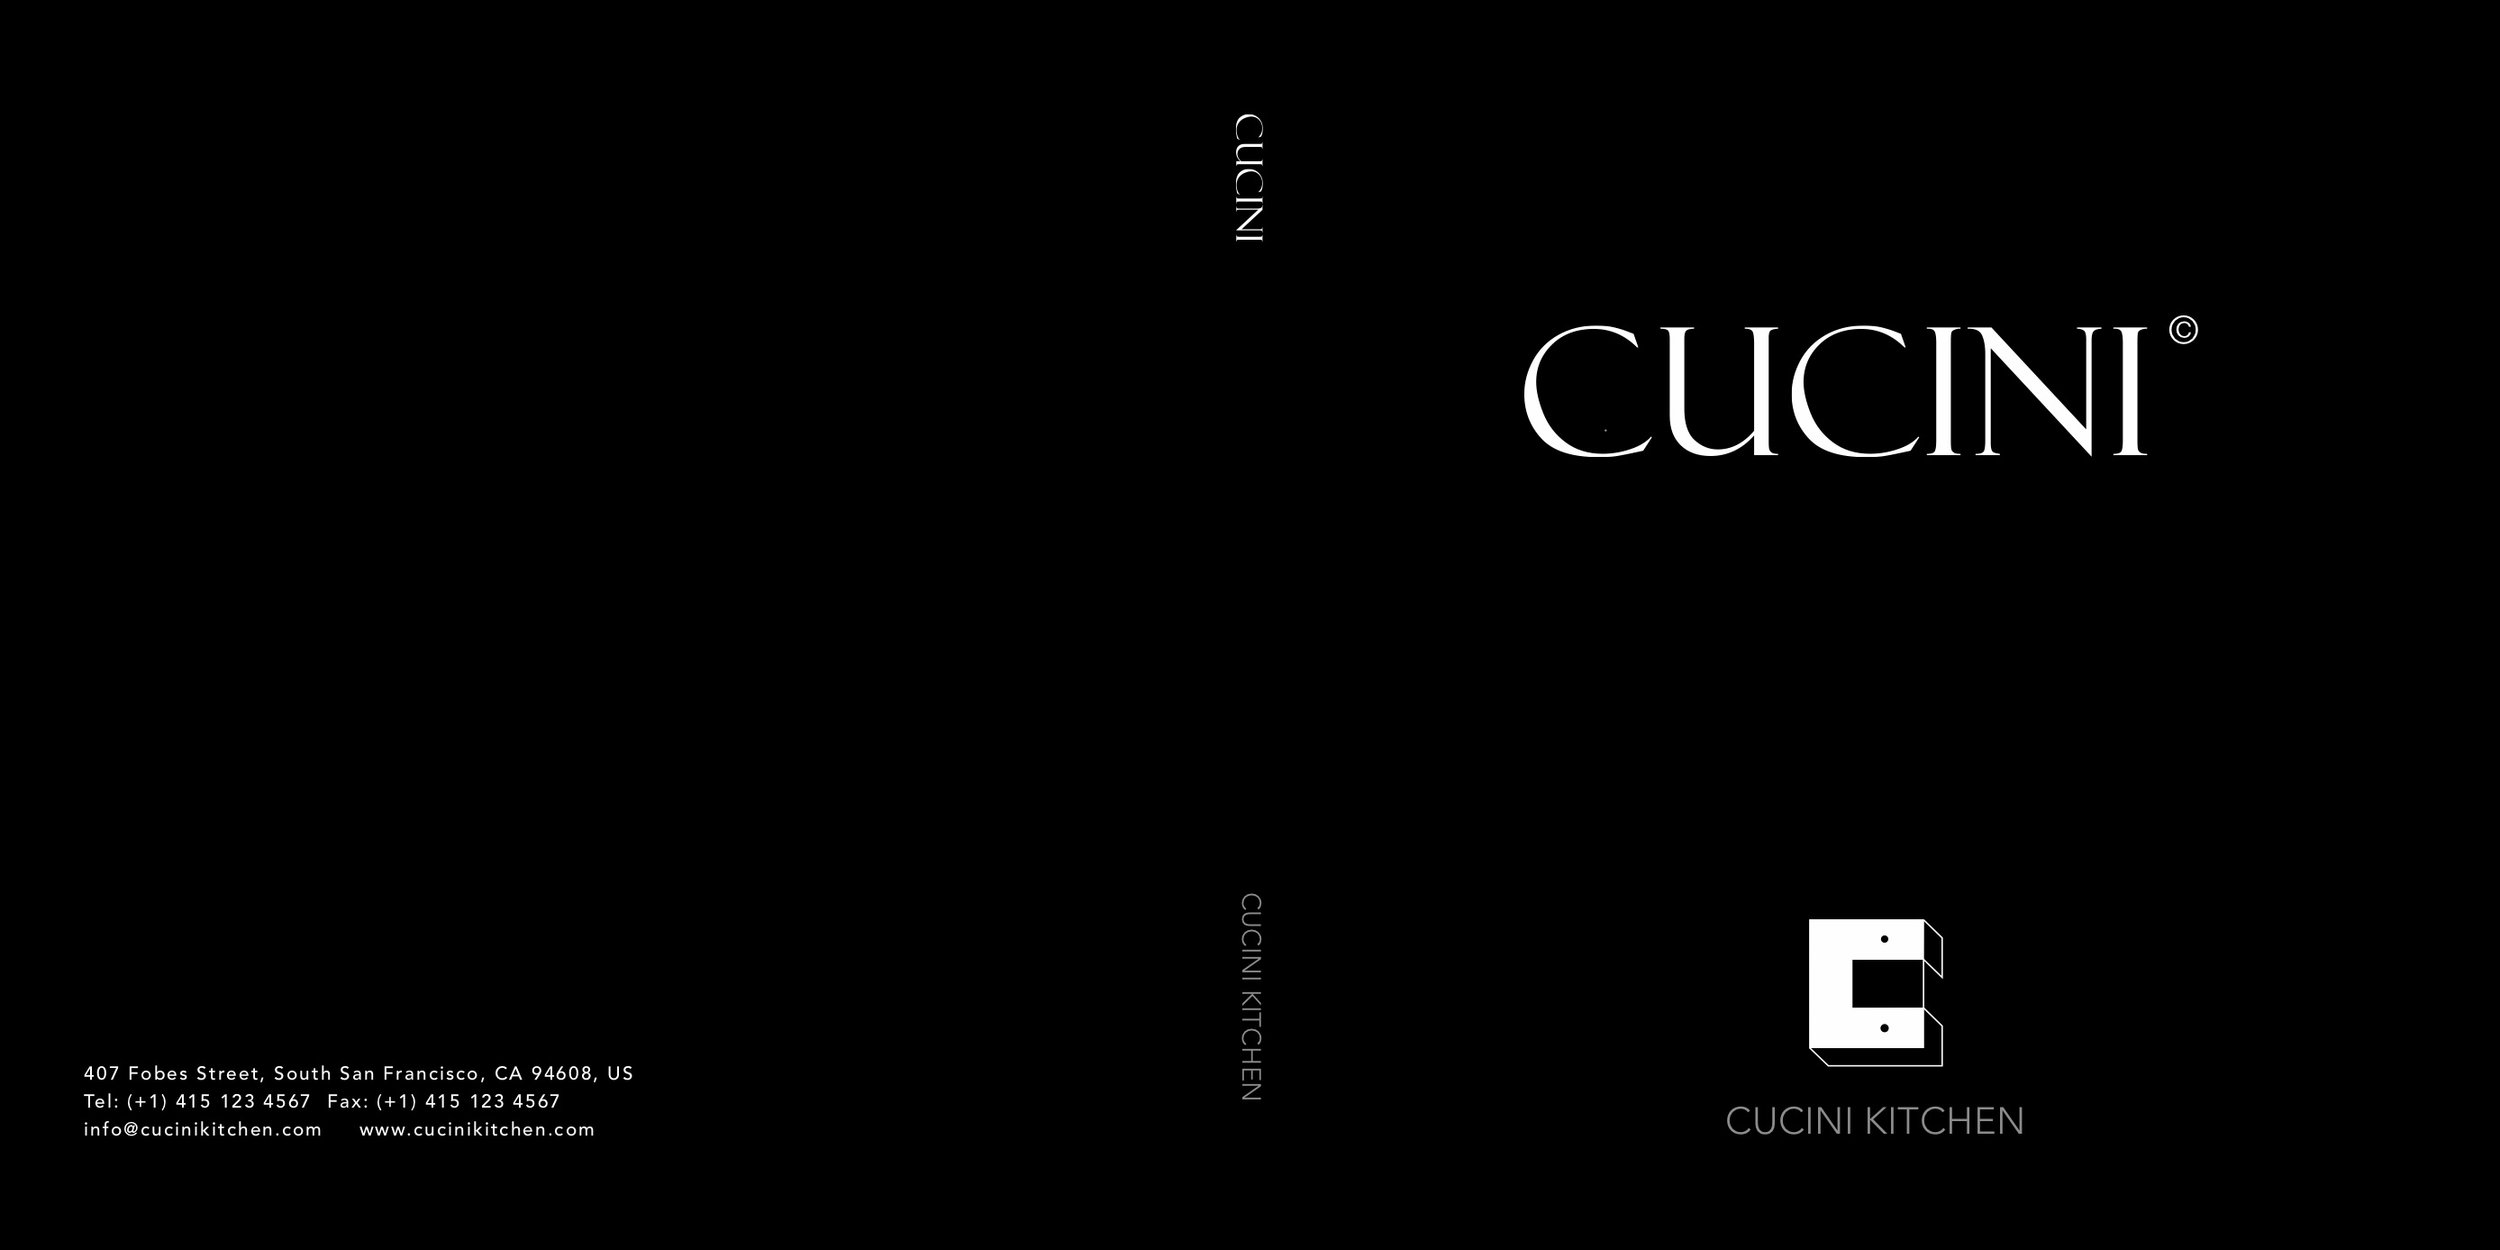 cucini_catalogo1.jpg